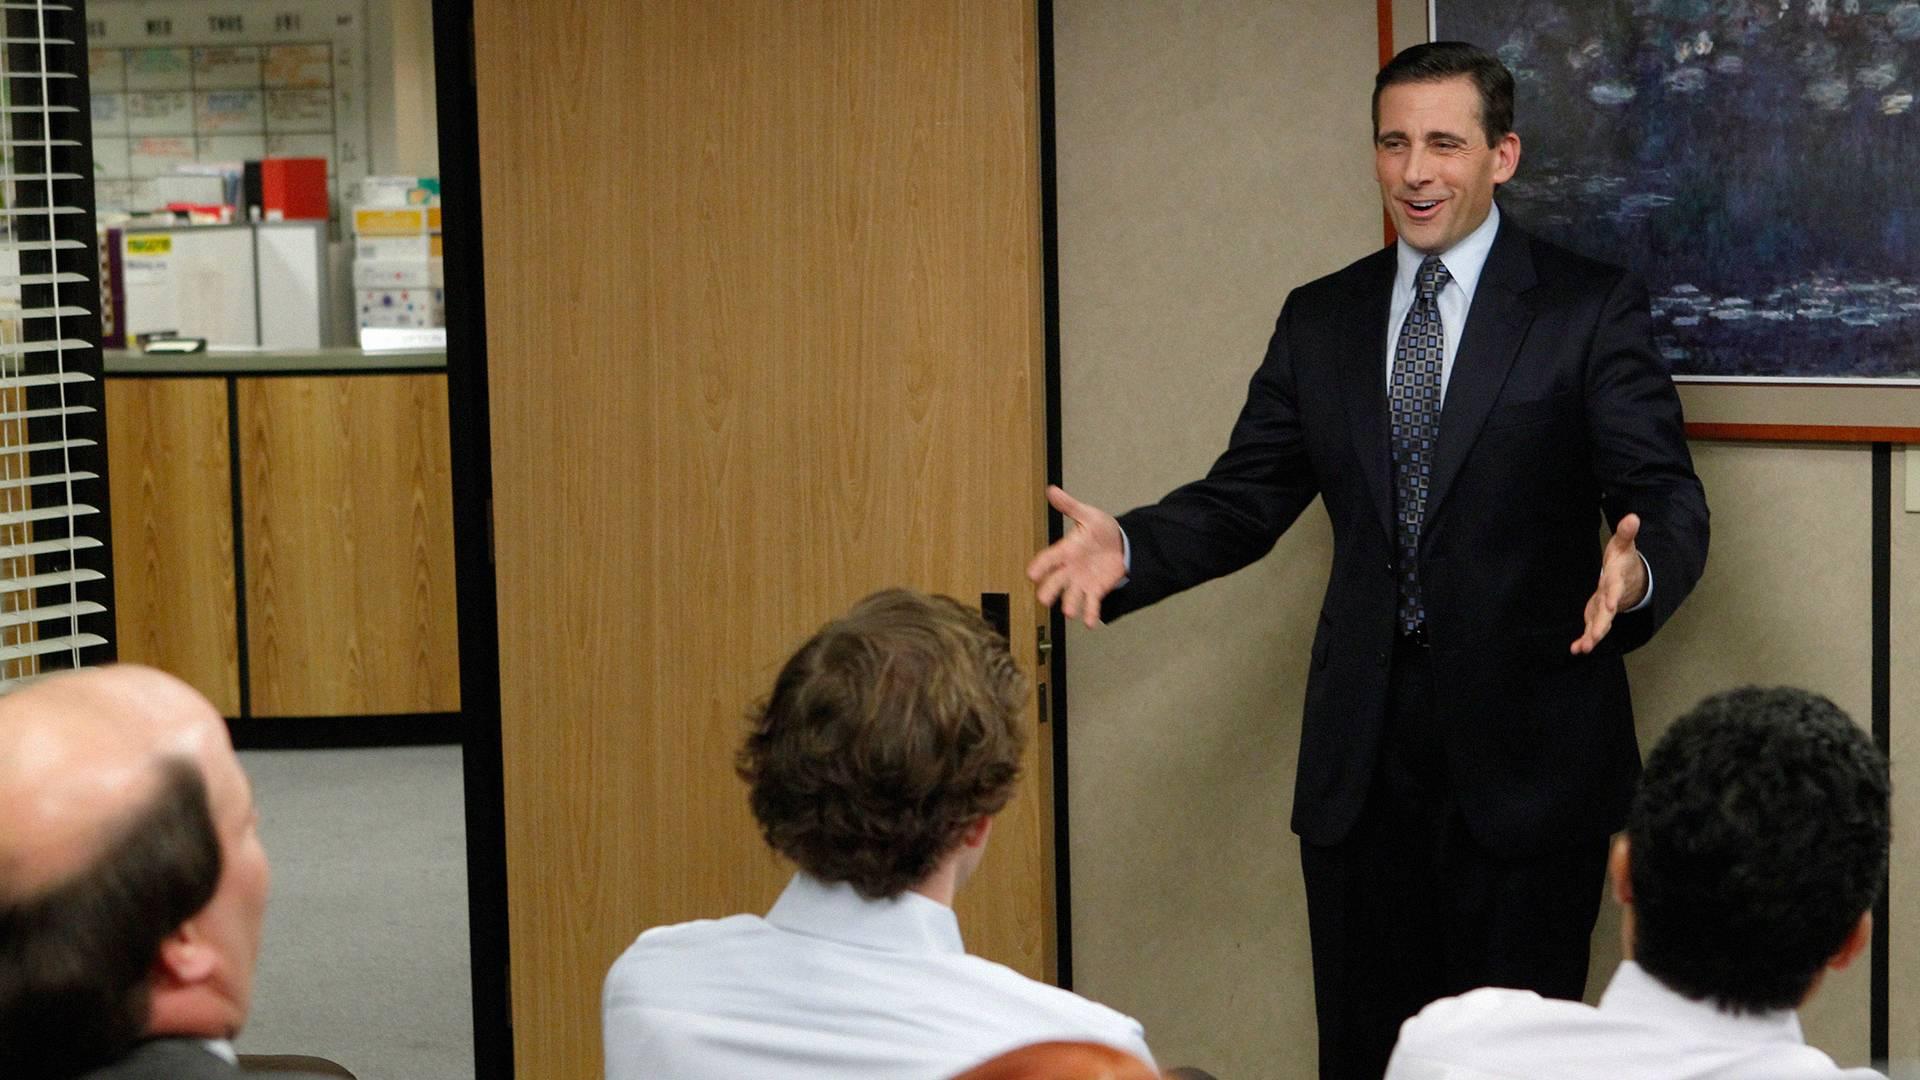 The Office Season 7 Episode 22